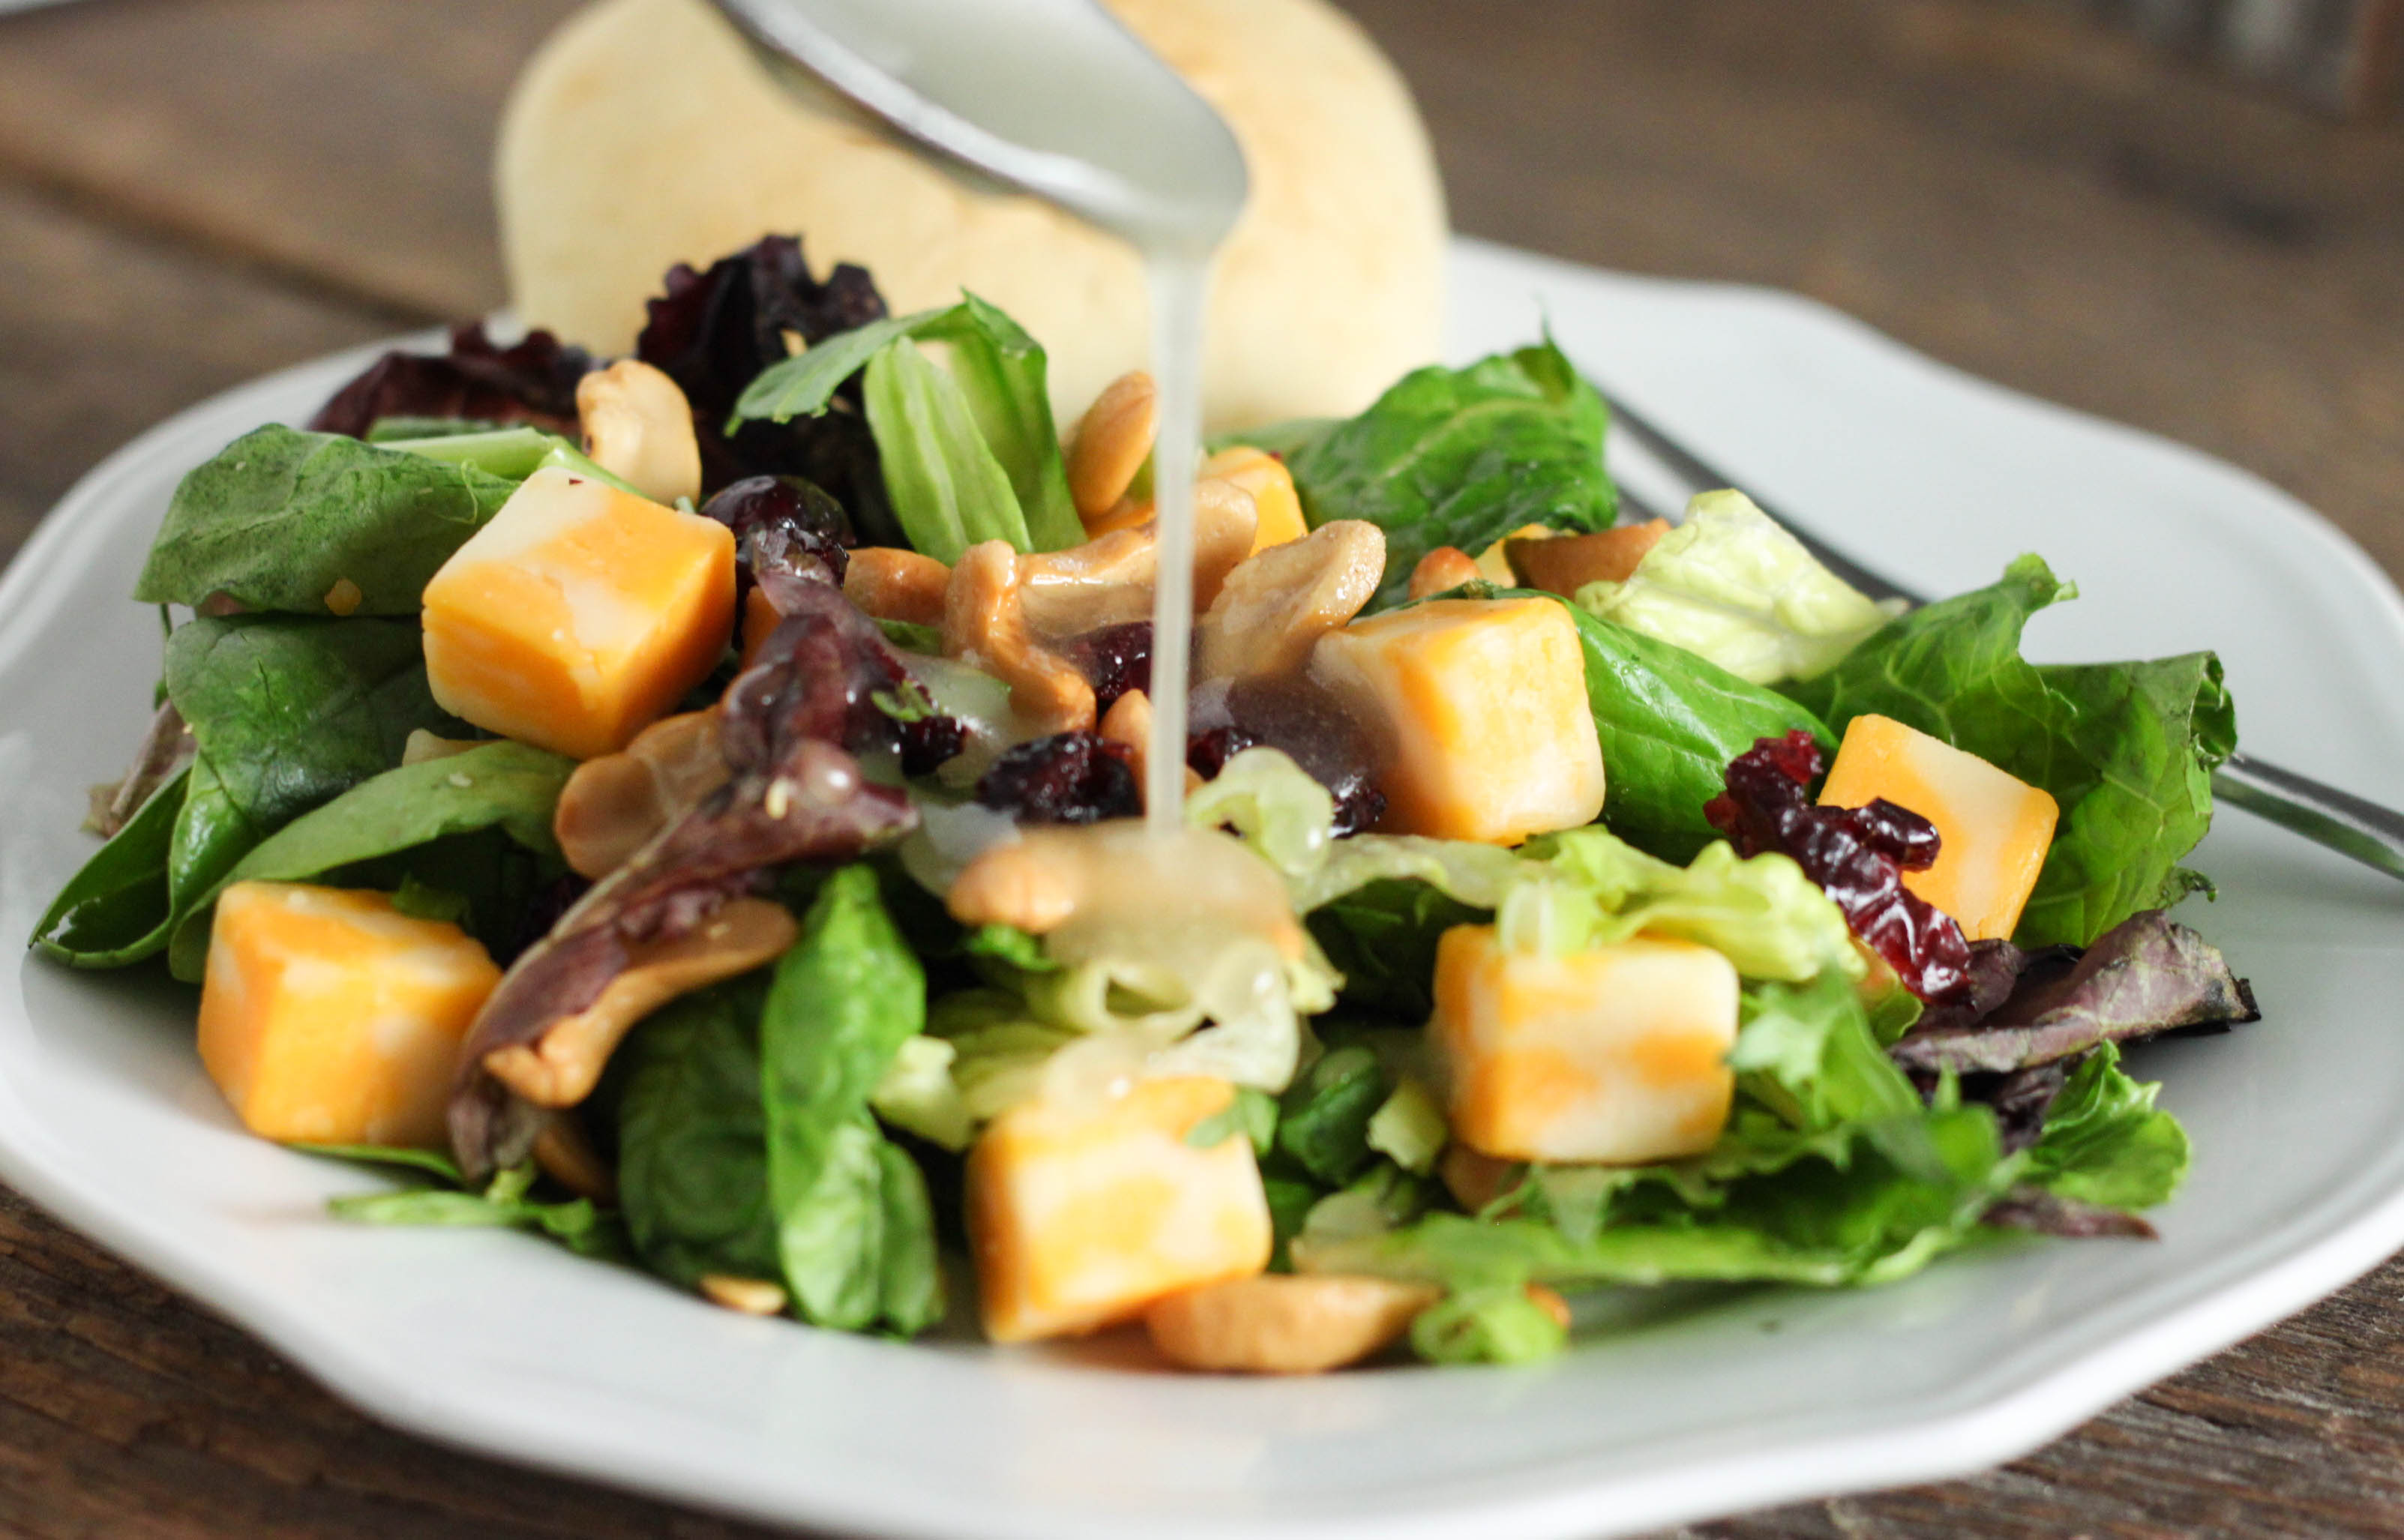 Cranberry Lettuce Salad - The Farmwife Cooks